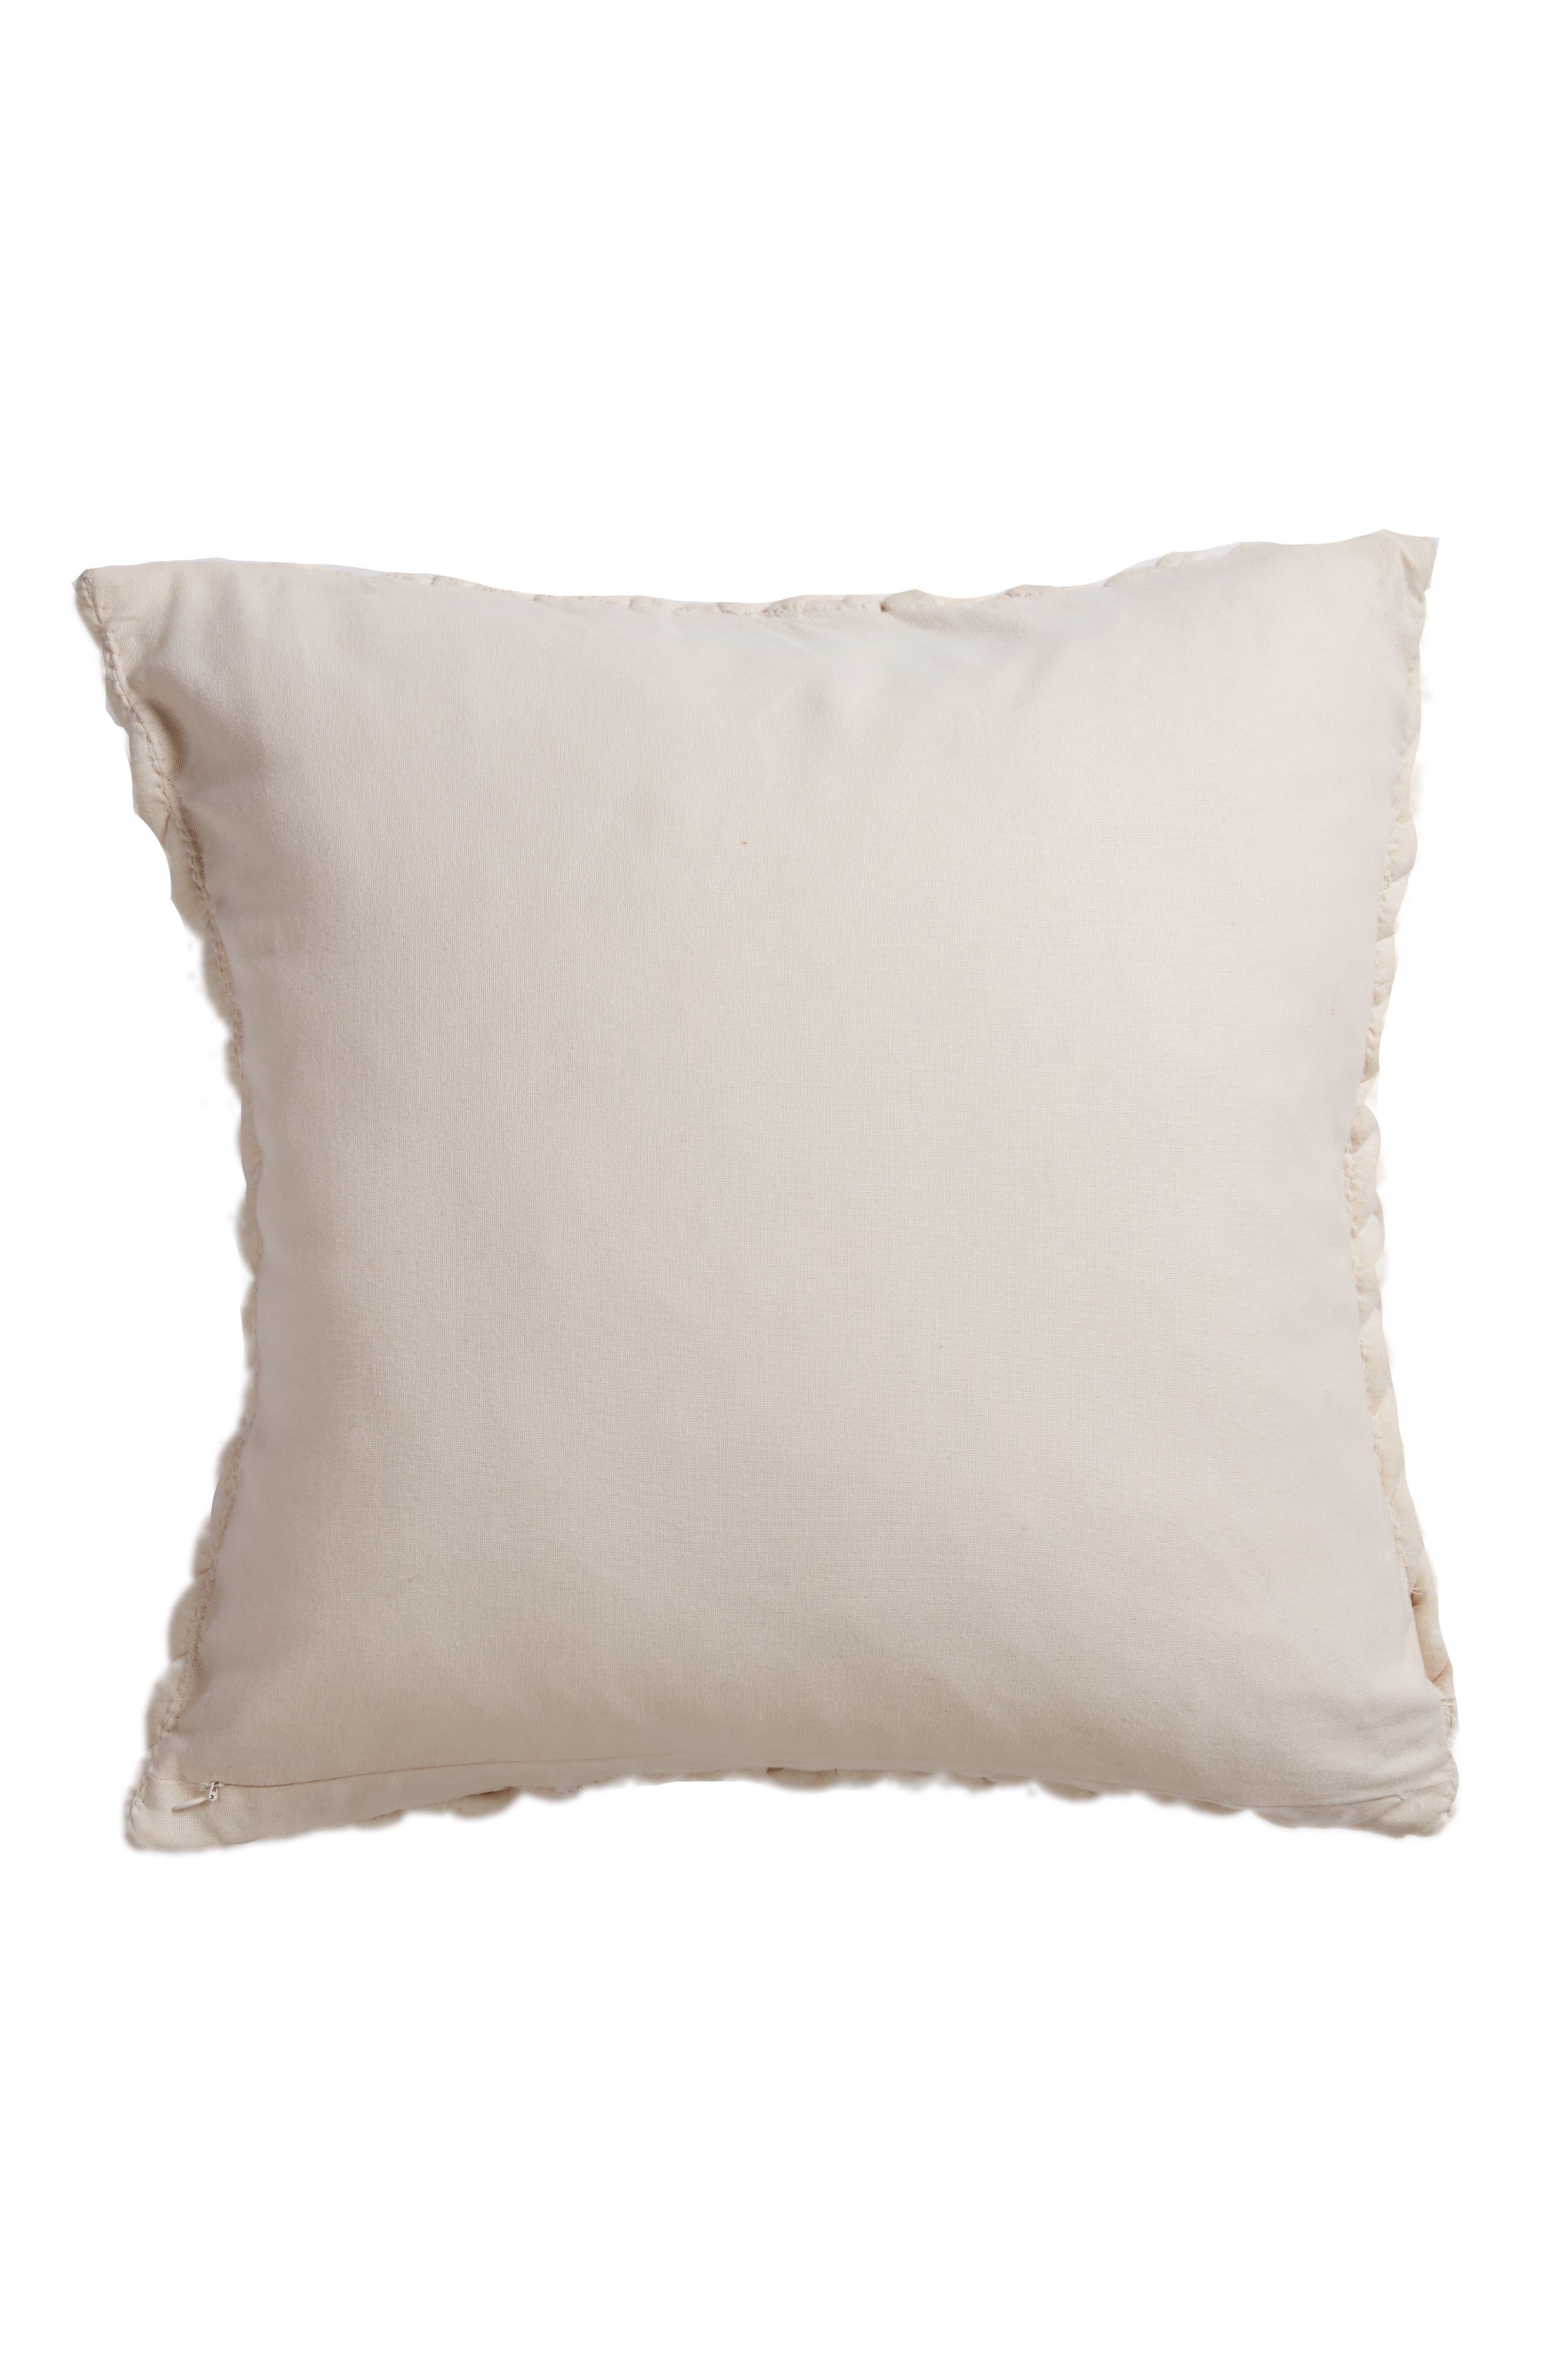 Jersey Braid Accent Pillow,                             Alternate thumbnail 2, color,                             250